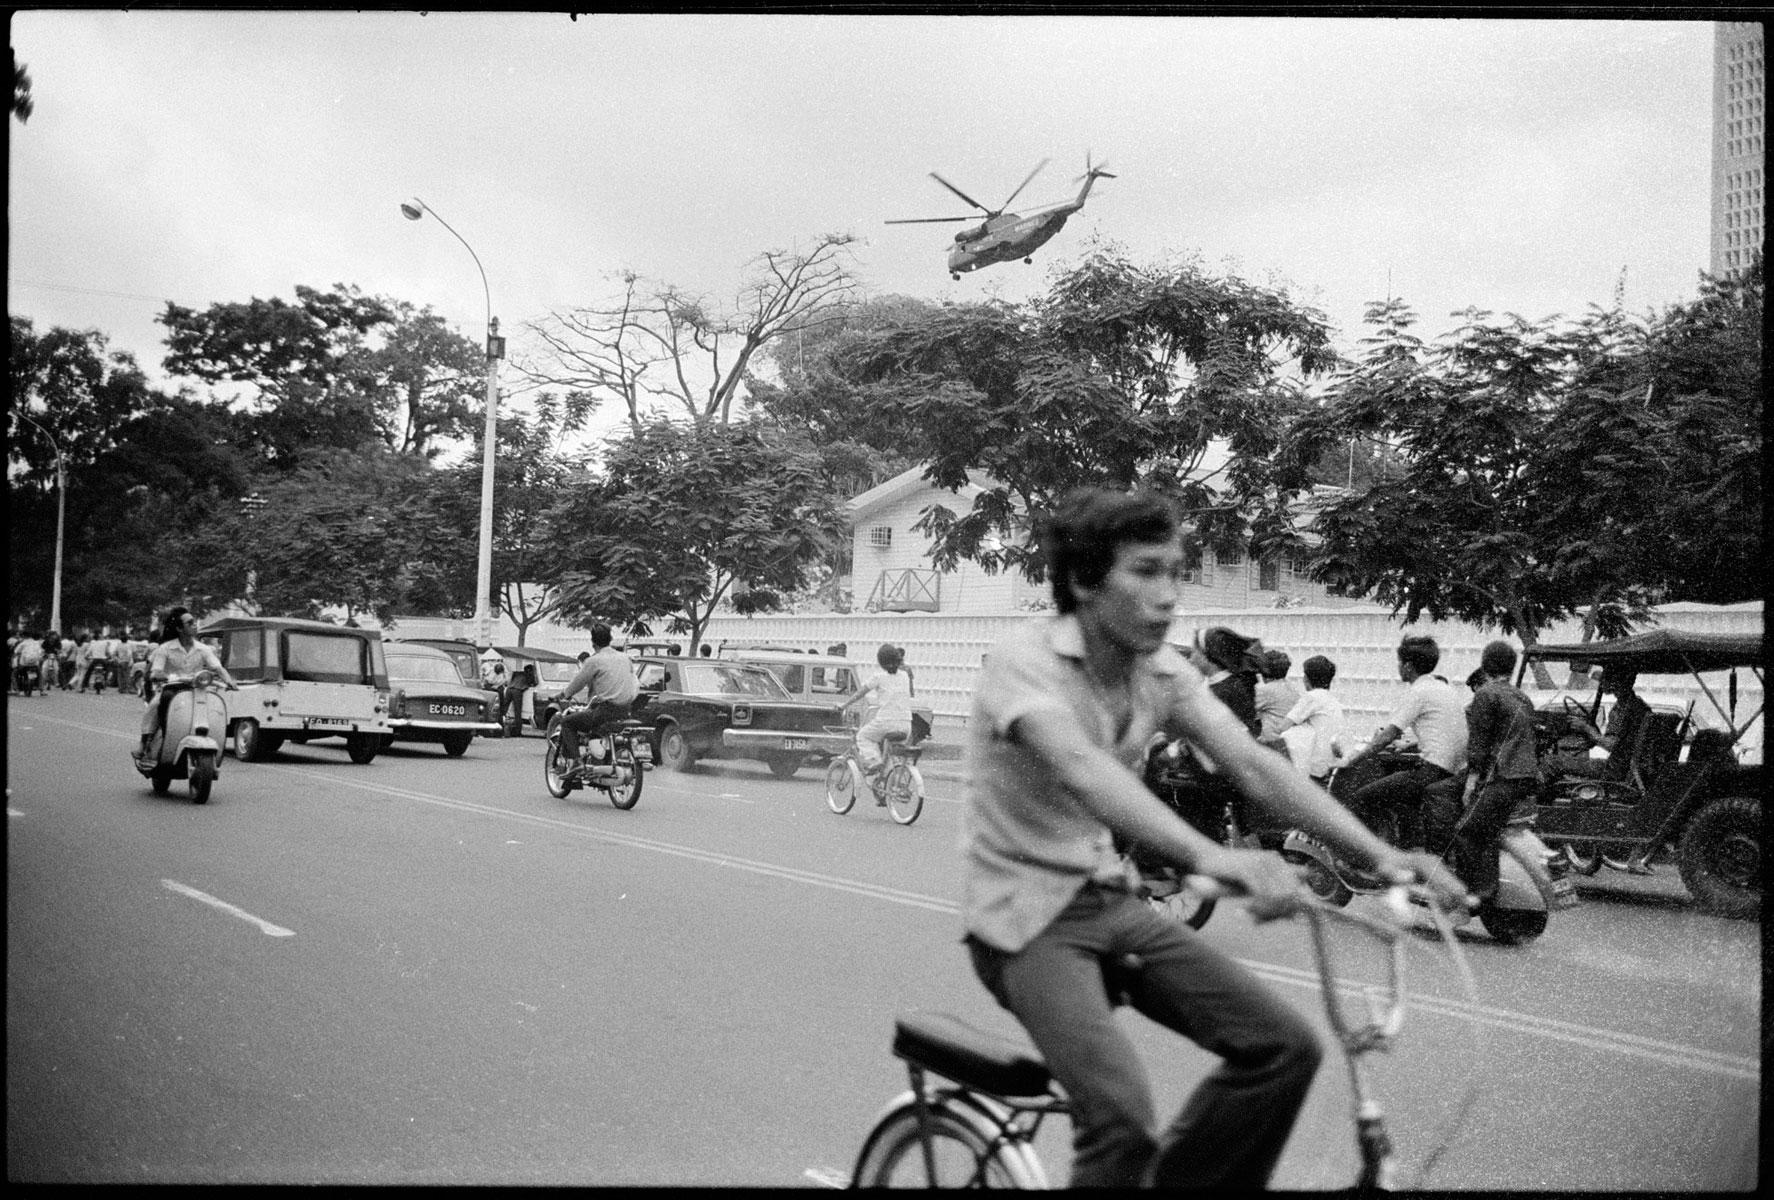 Chute / Libération de Saigon, avril 1975 DCL_VIETNAM_1975_006_17A_18